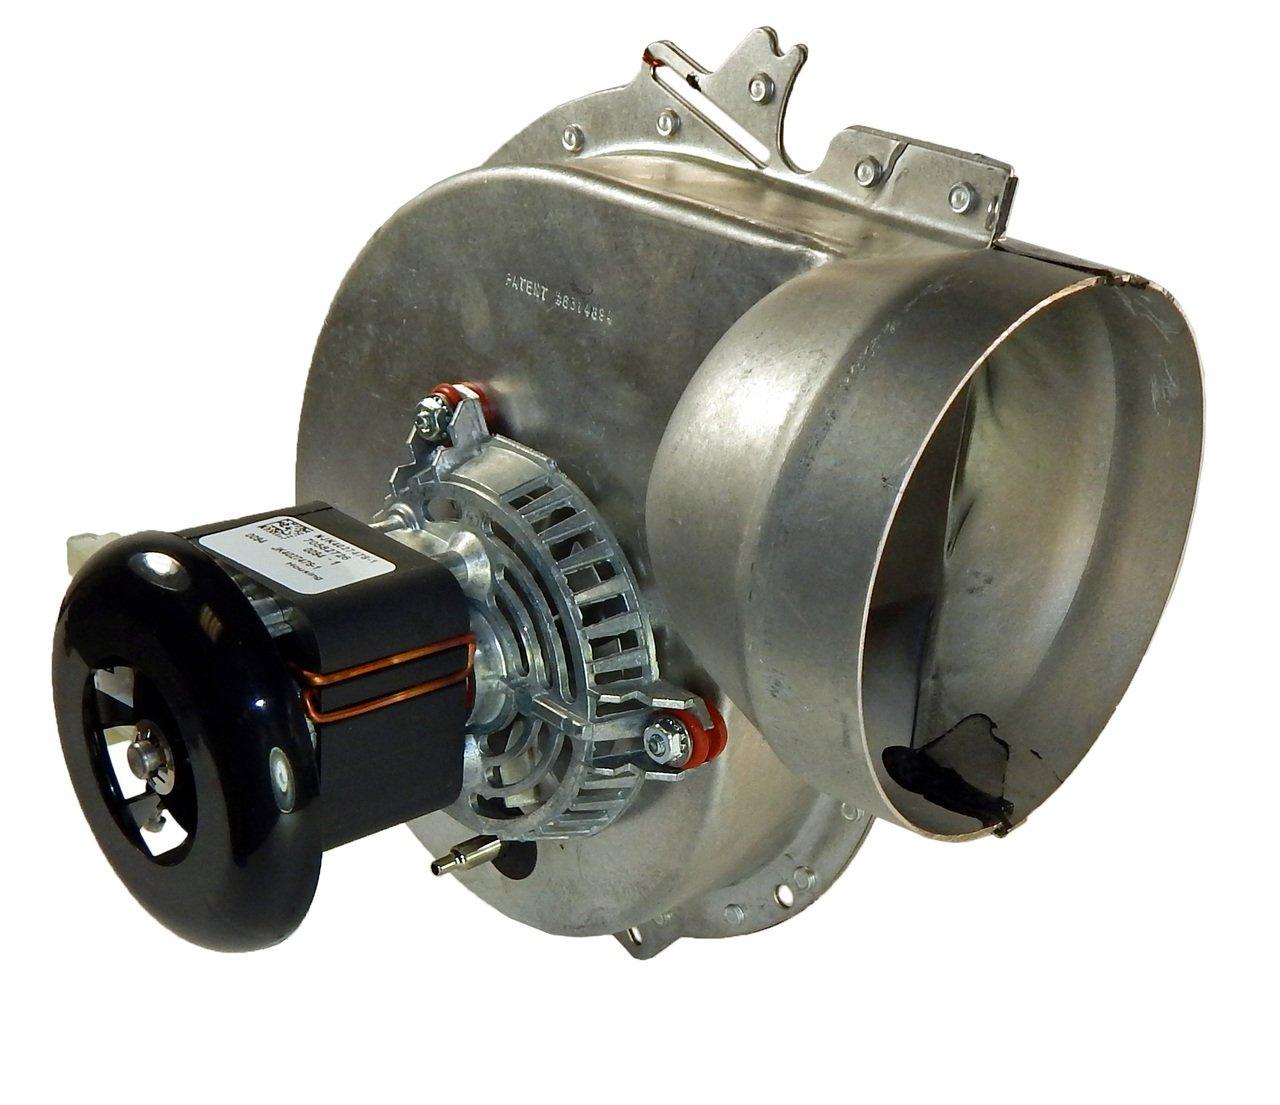 1014529 ICP Furnace Draft Inducer Exhaust Venter Popular standard OEM Vent Motor Time sale